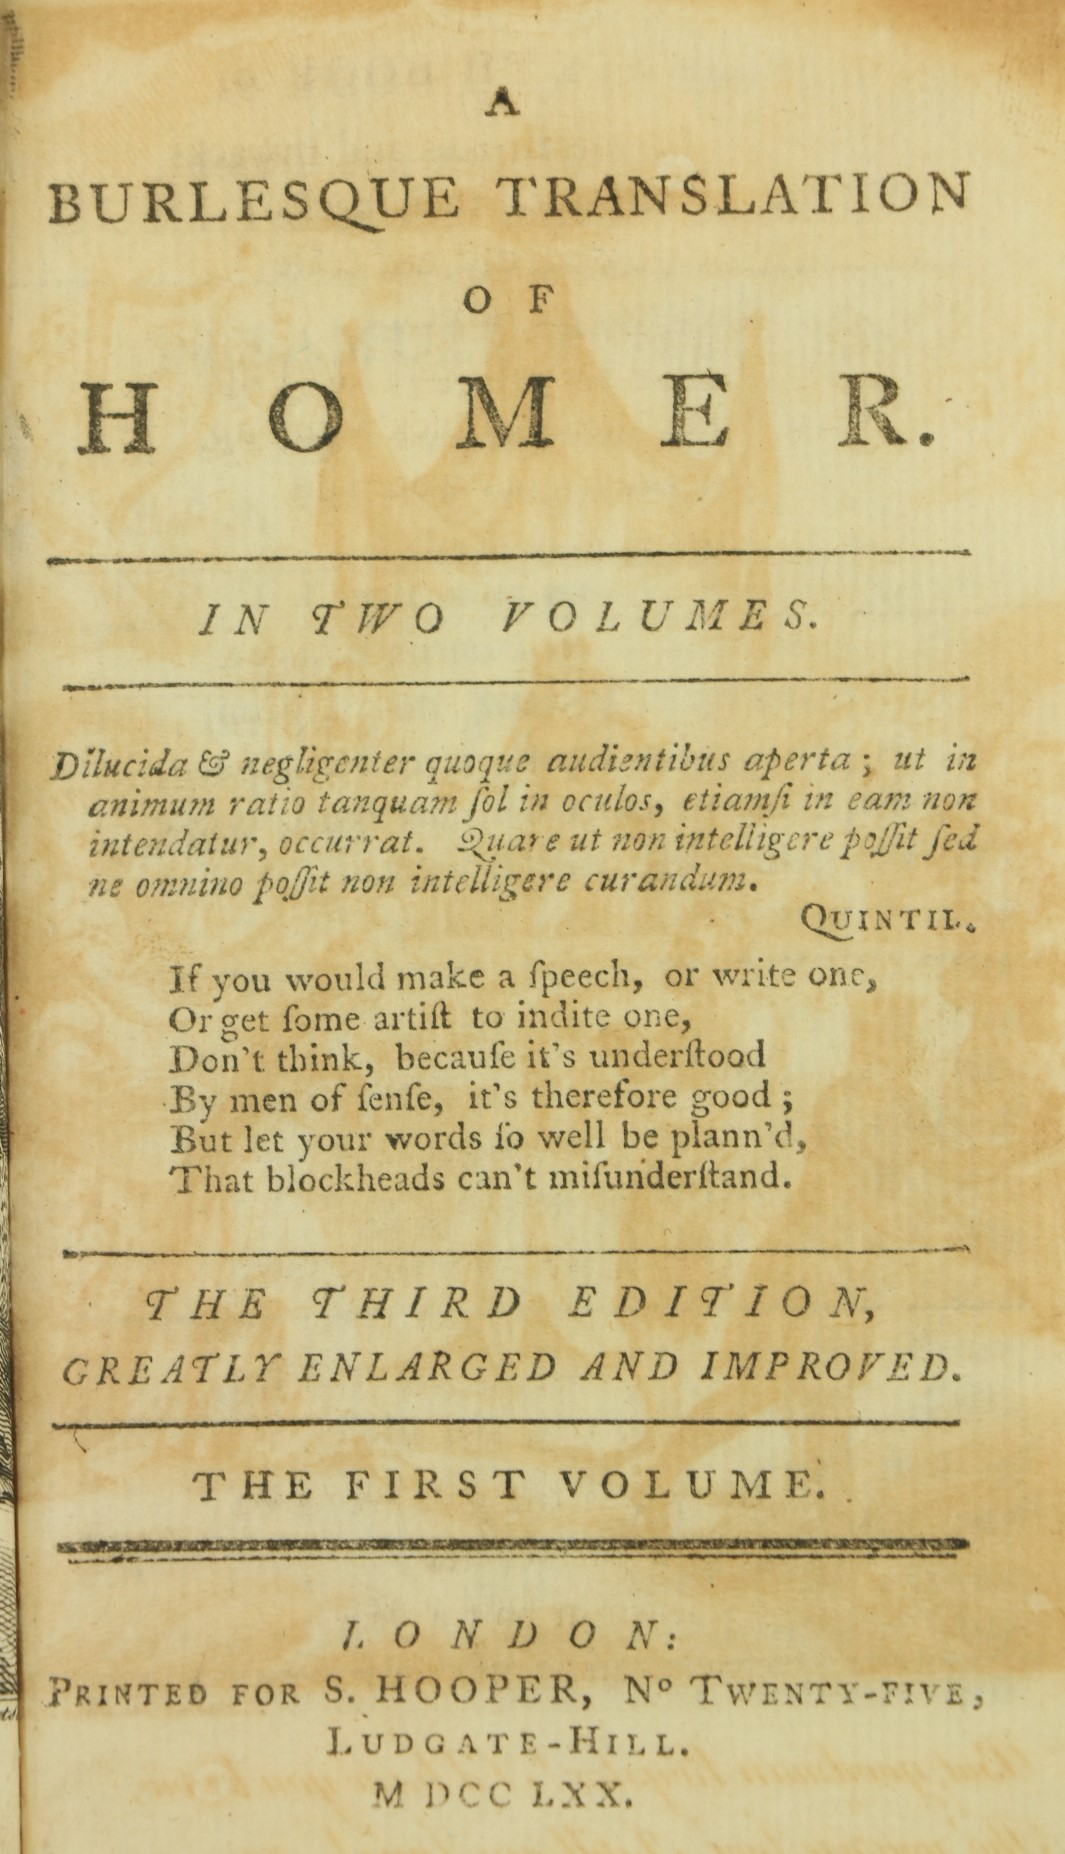 [Brydges (Thos.)]ÿA Burlesque Translationÿof Homer, 2 vols. 12mo L. 1770.ÿThird Edn.,ÿ2 engd. - Image 4 of 4